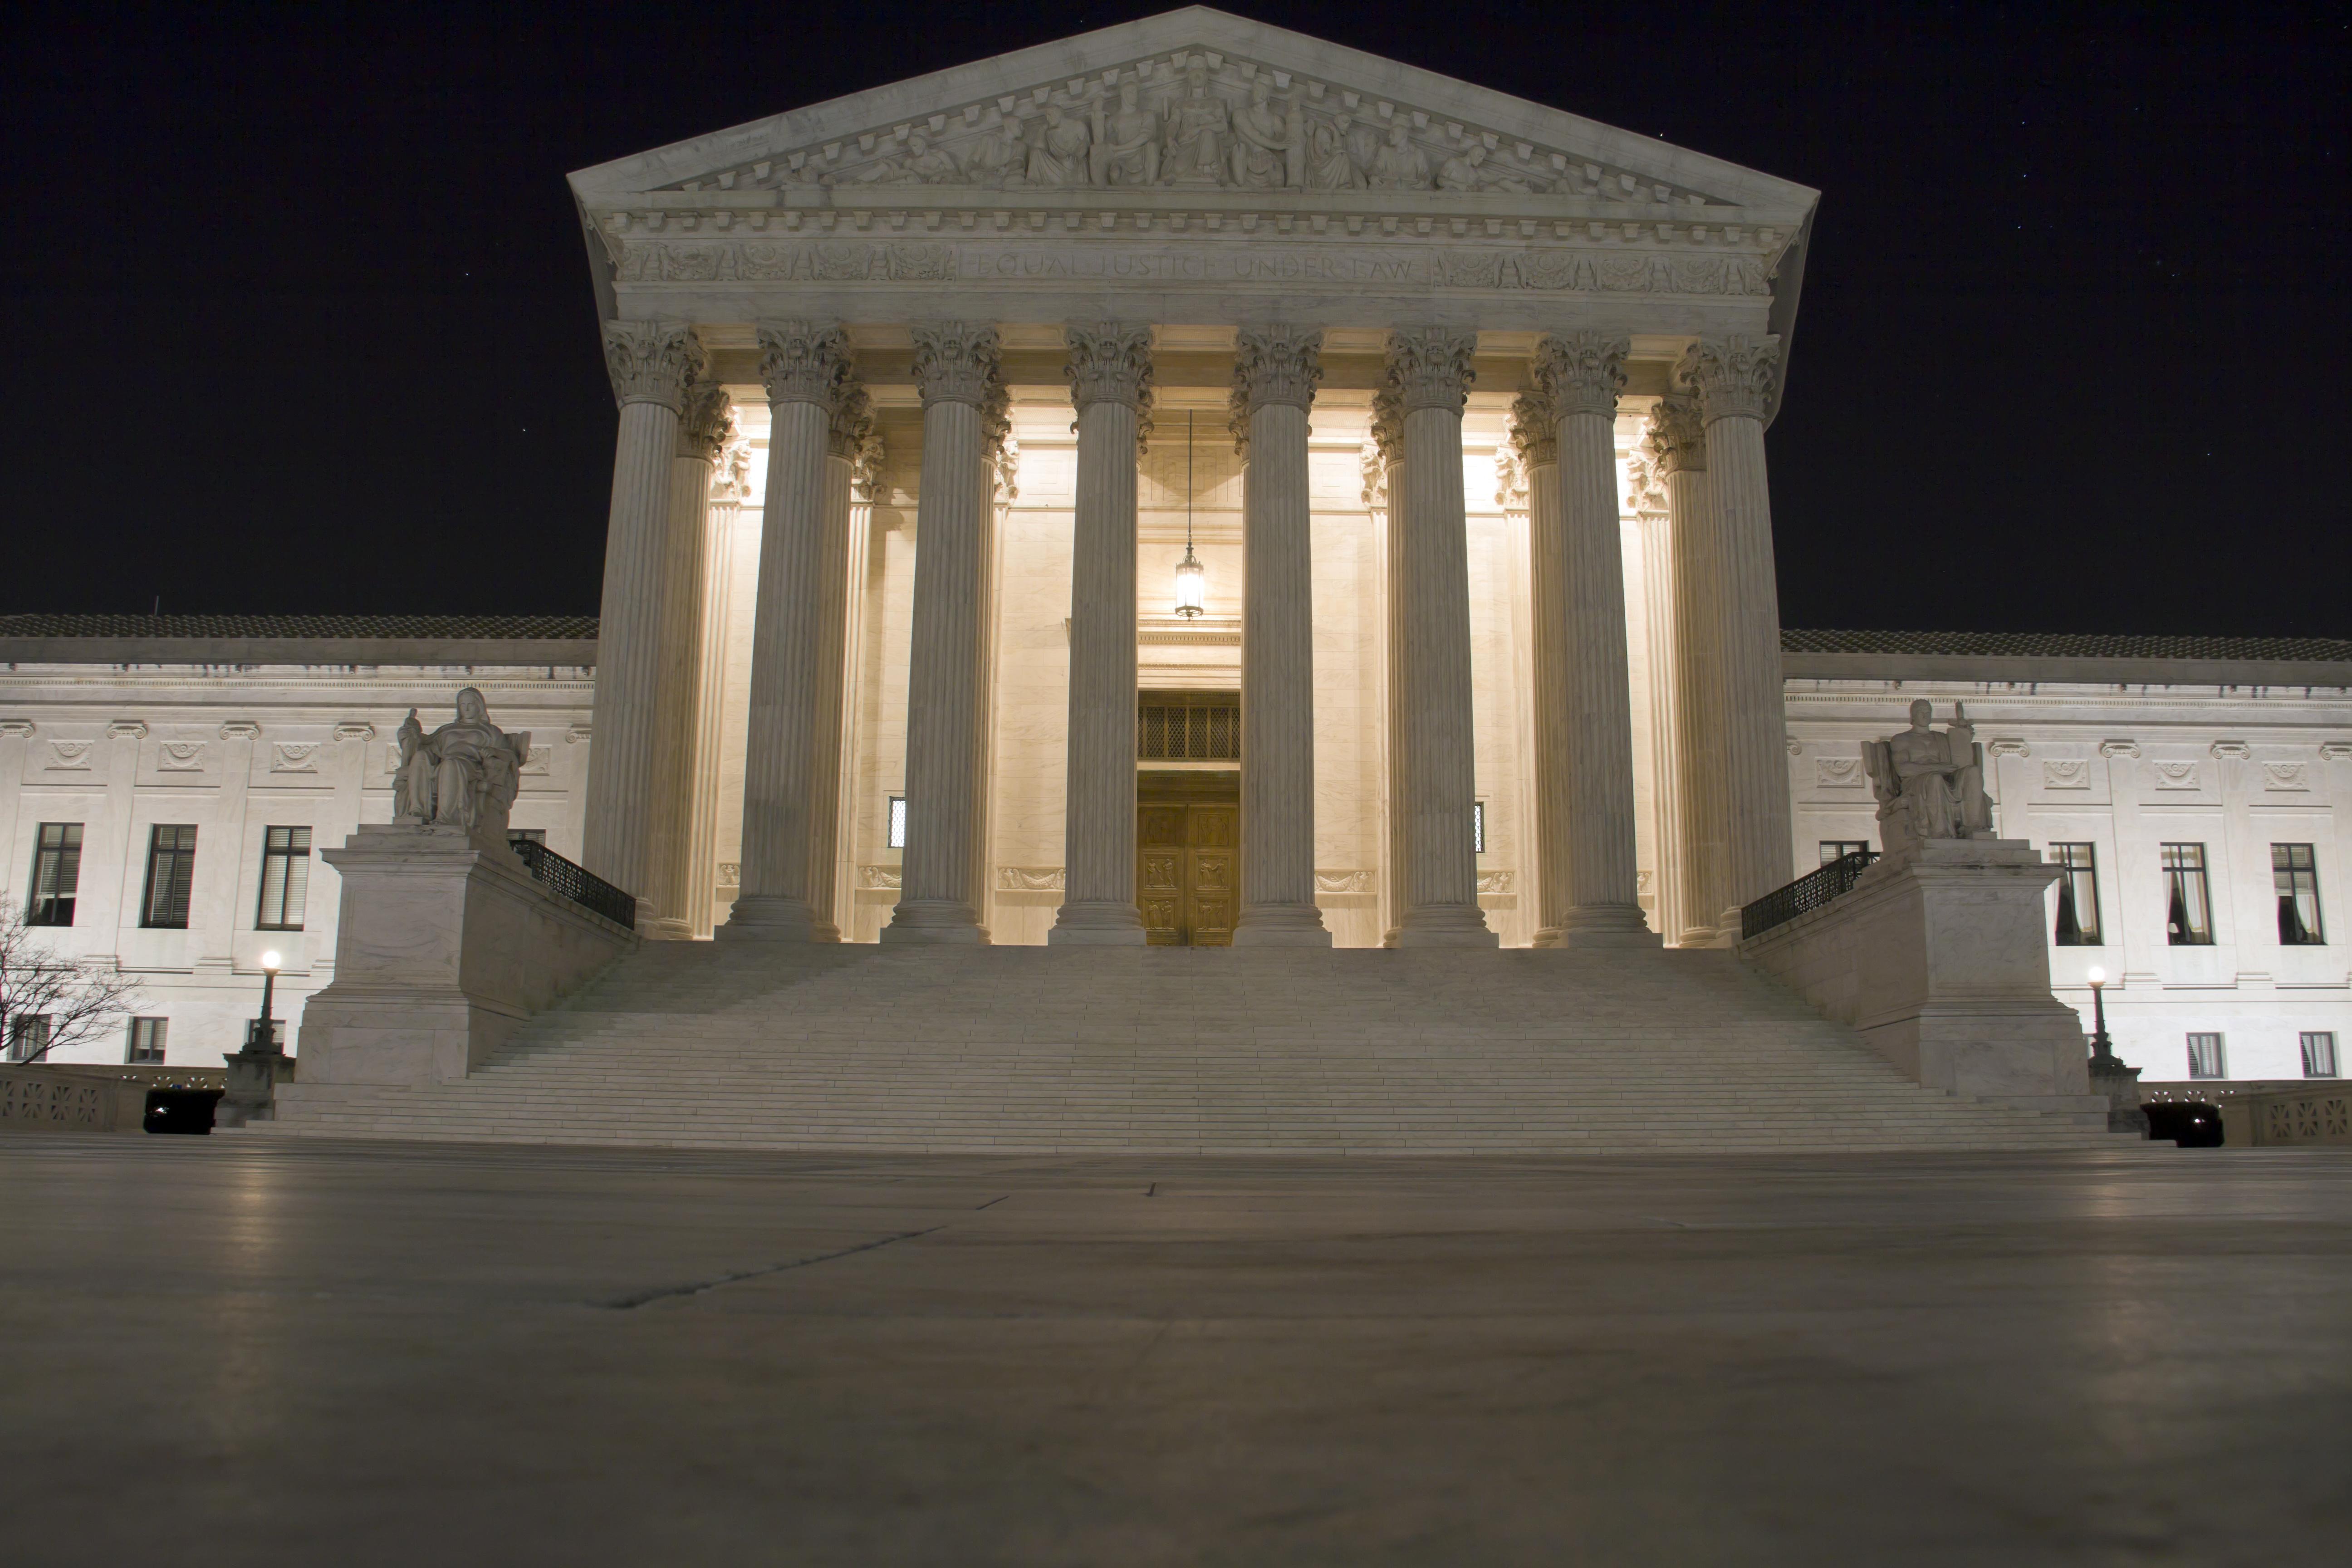 Scalia's Legacy of Civility